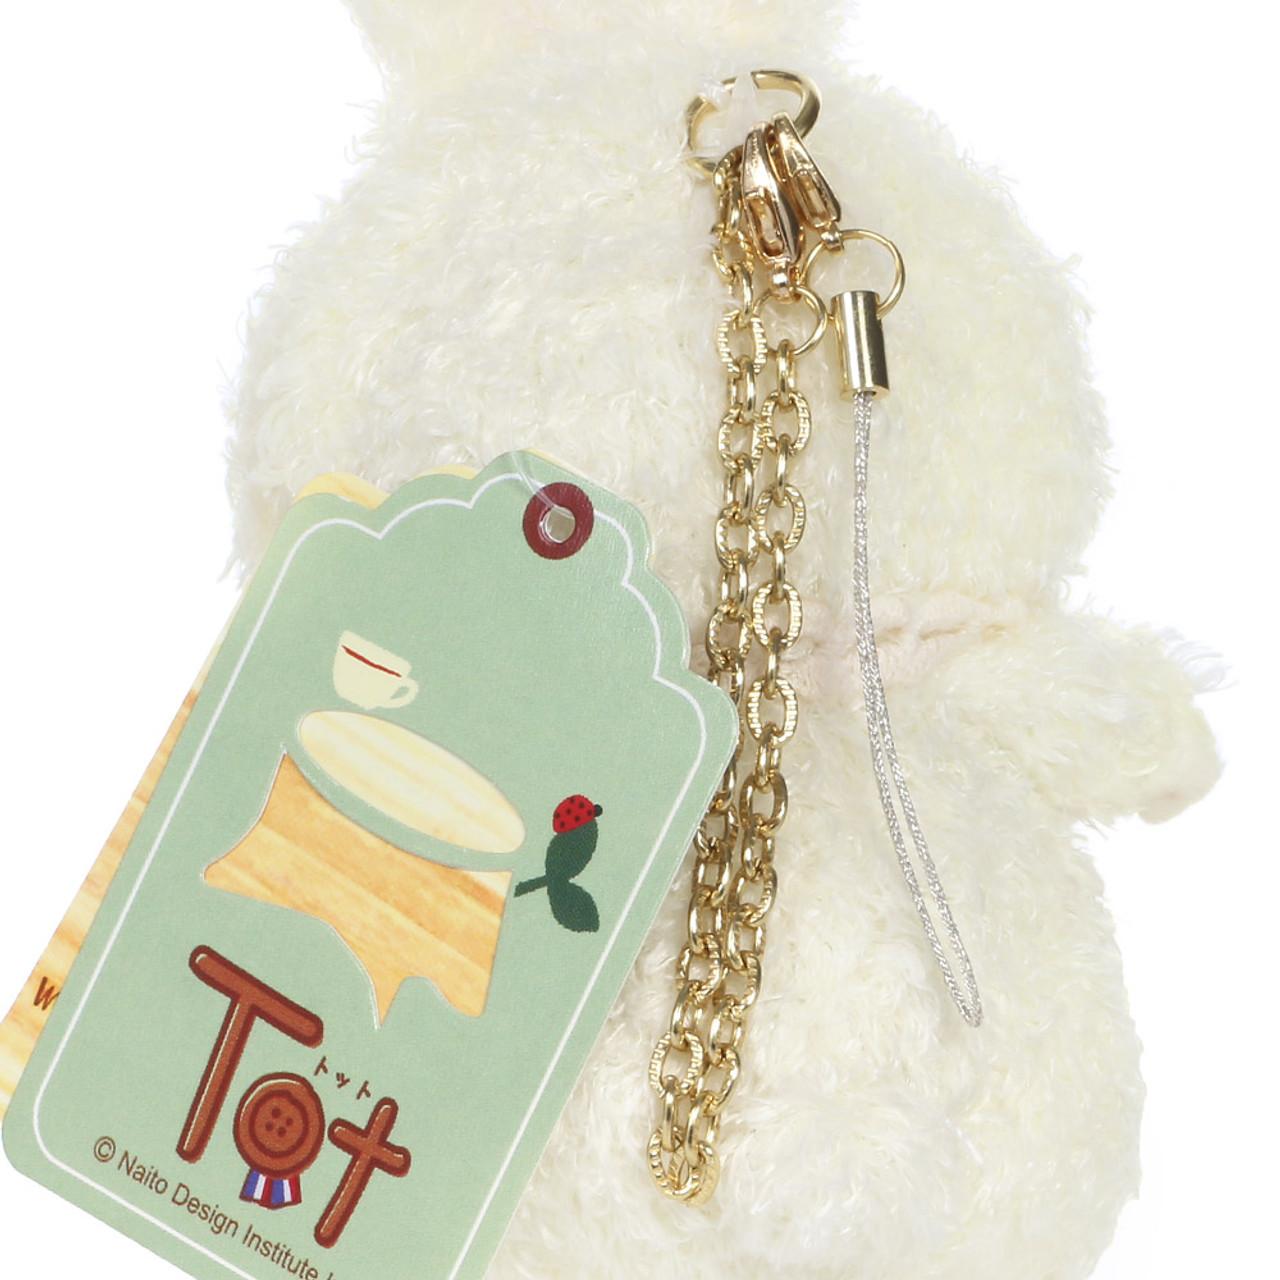 Naito Design Tot Series Rabbit Doll Charms - Lamu ( Chains View )